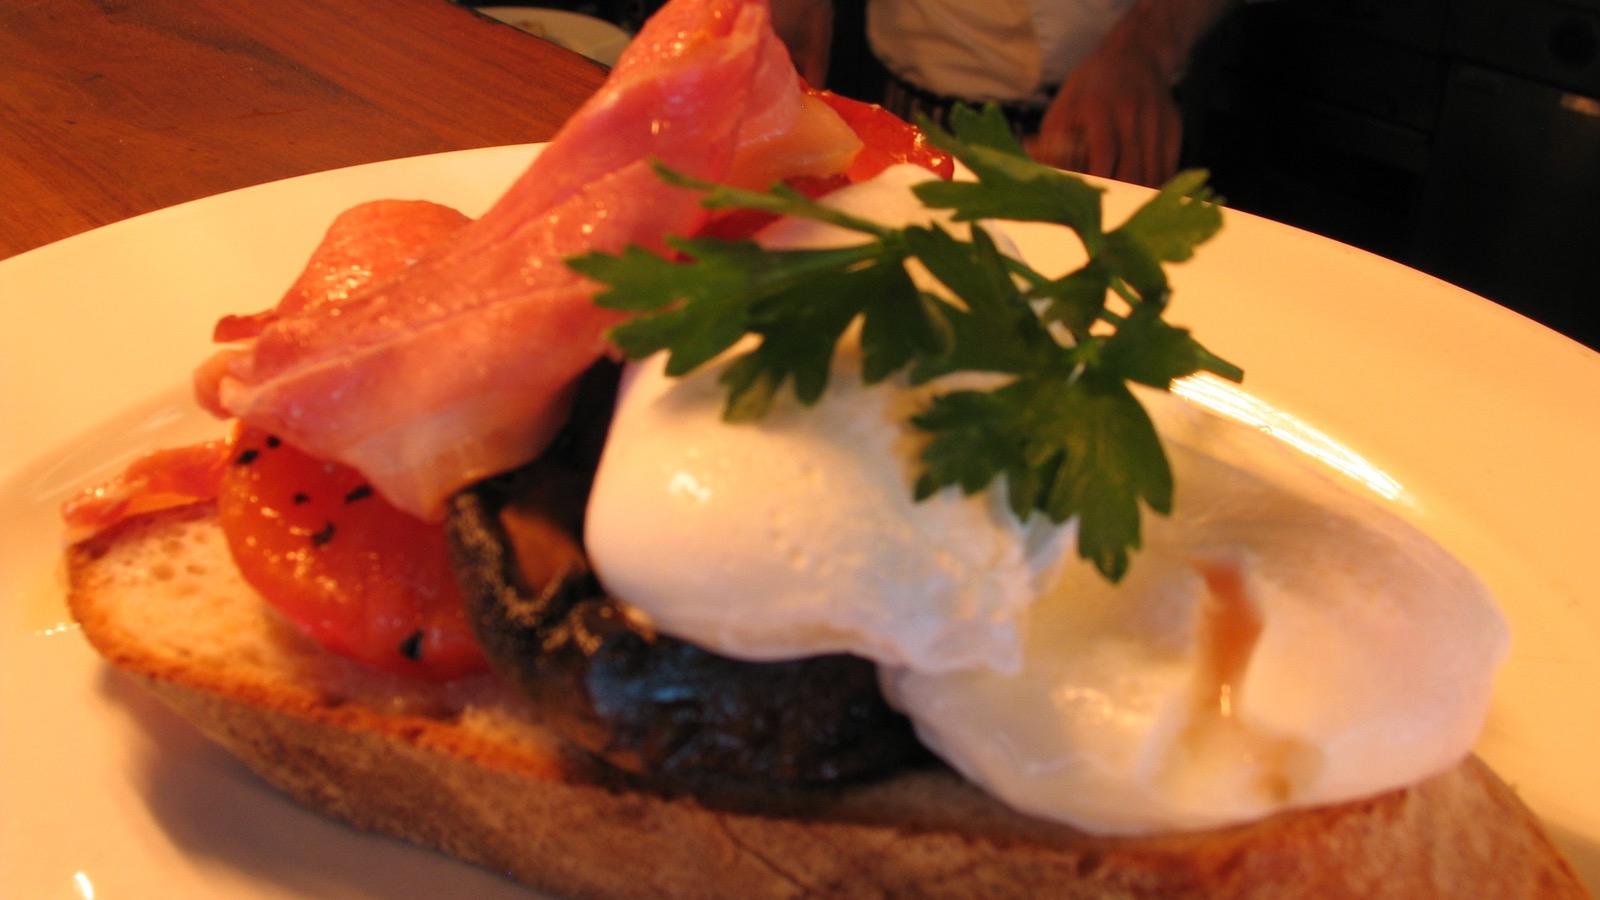 Delicious breakfast at Rochford